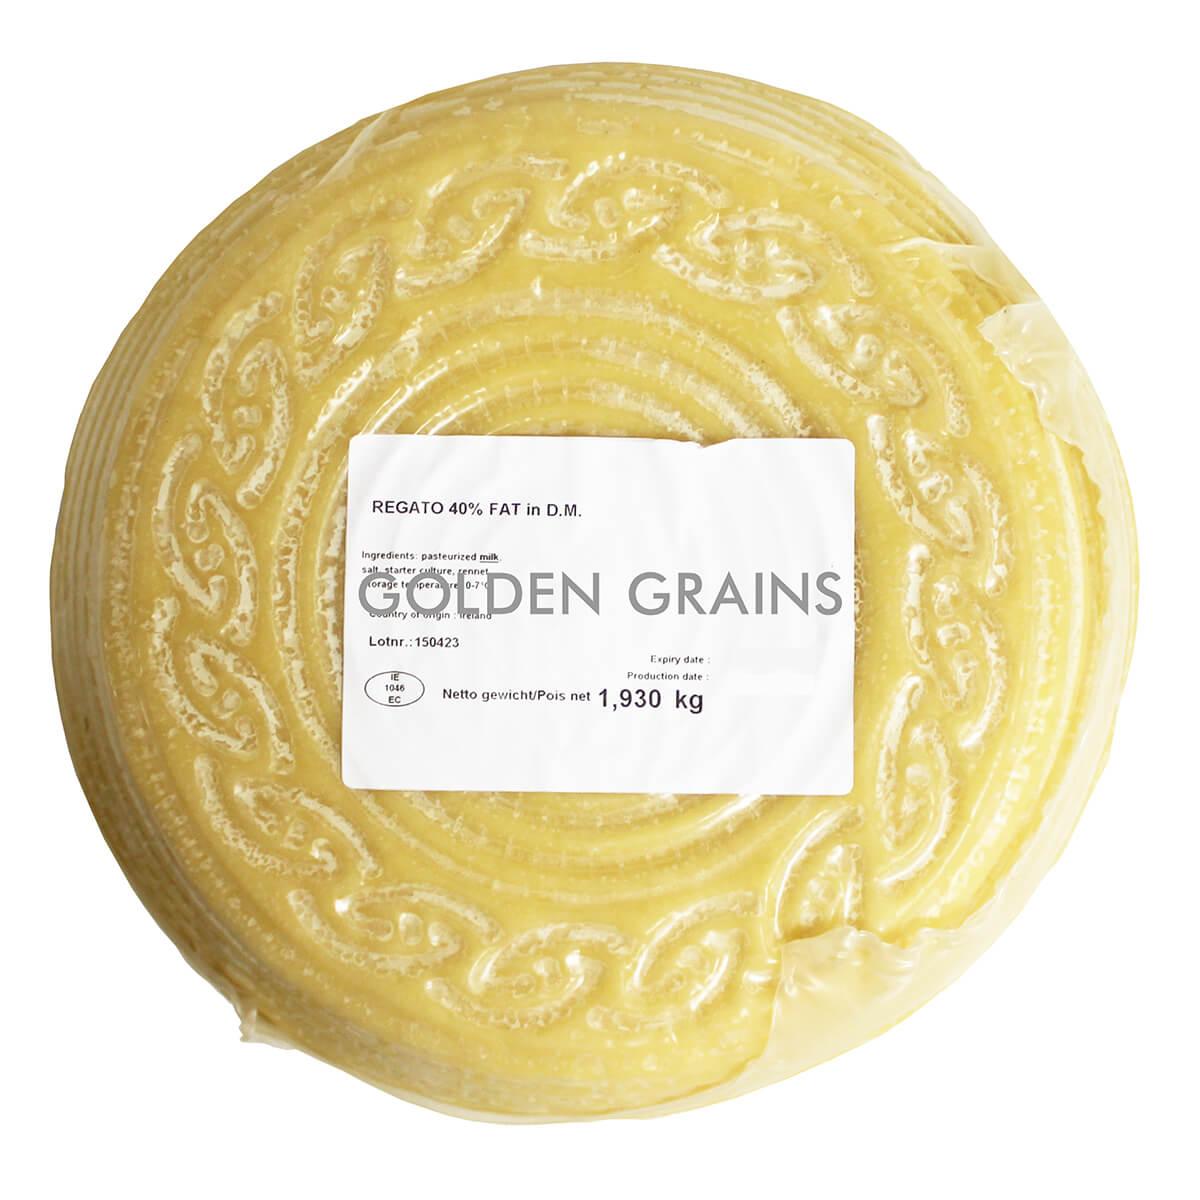 Golden Grains Dubai Export - Regato - Front.jpg